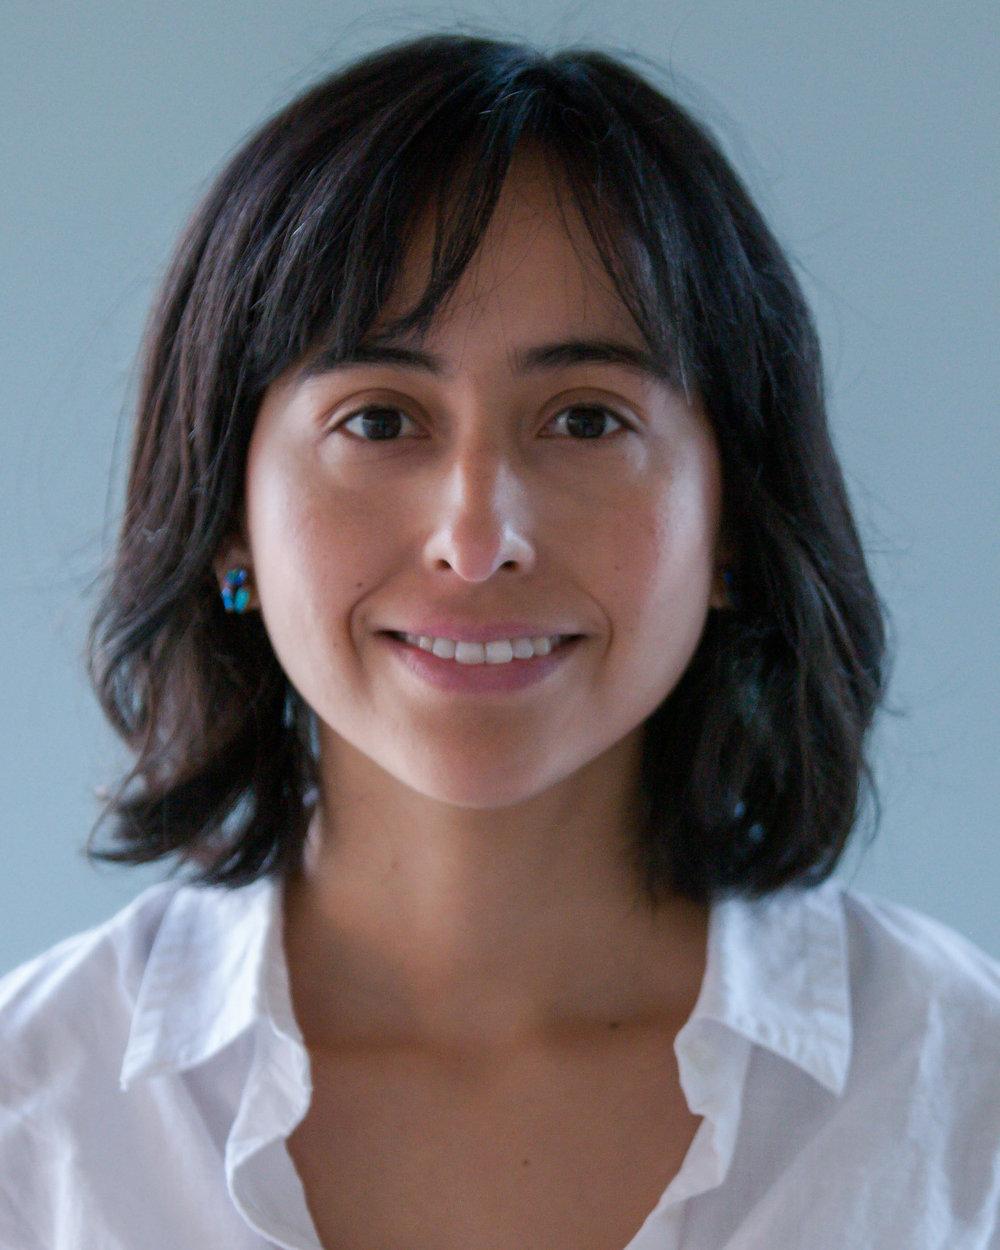 Sesam Lopez Natalia.jpg